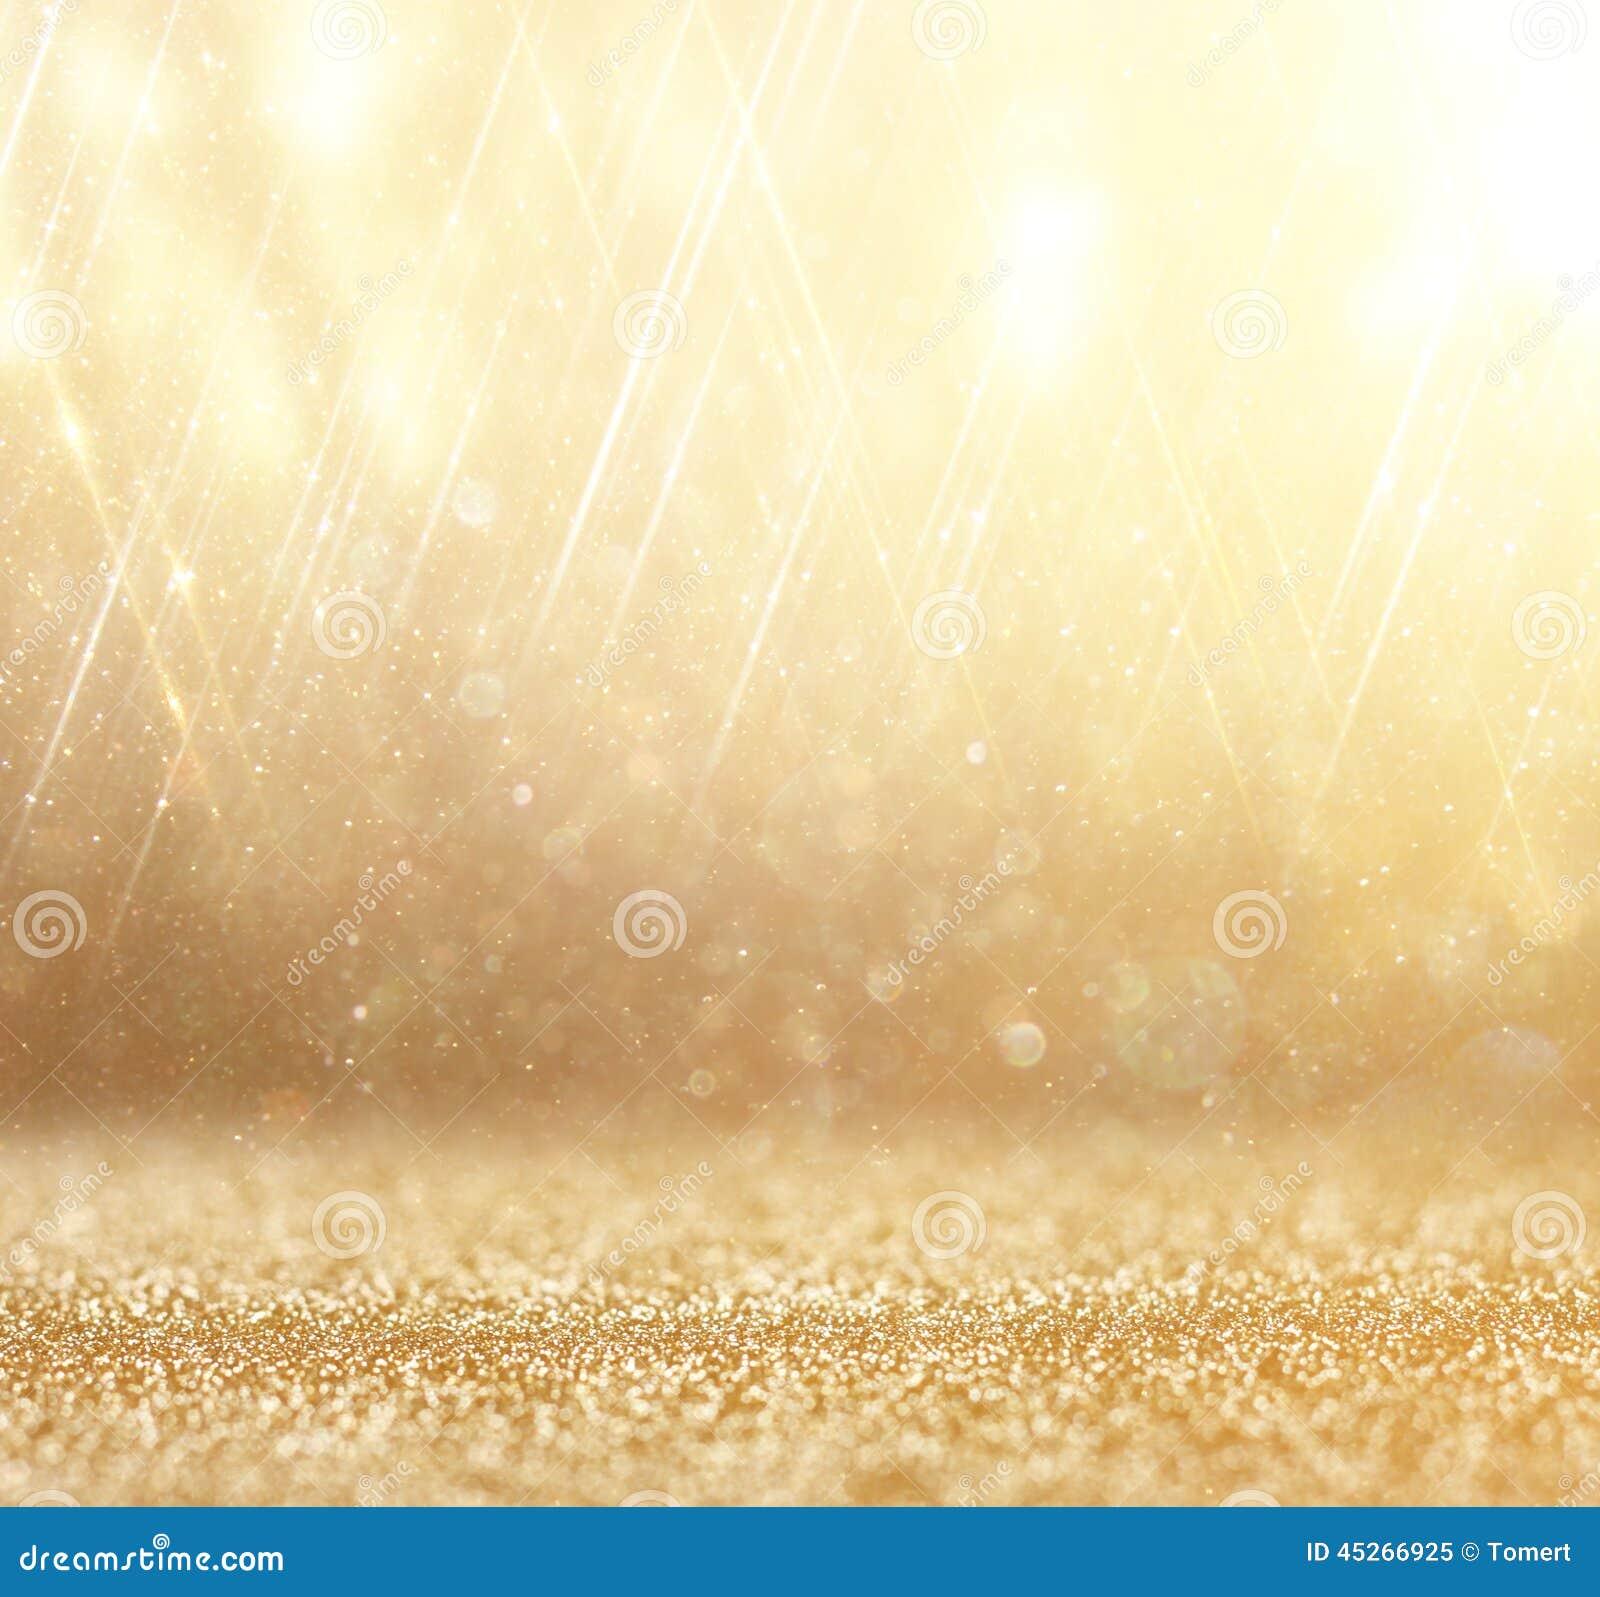 Glitter vintage lights background. abstract gold background . defocused